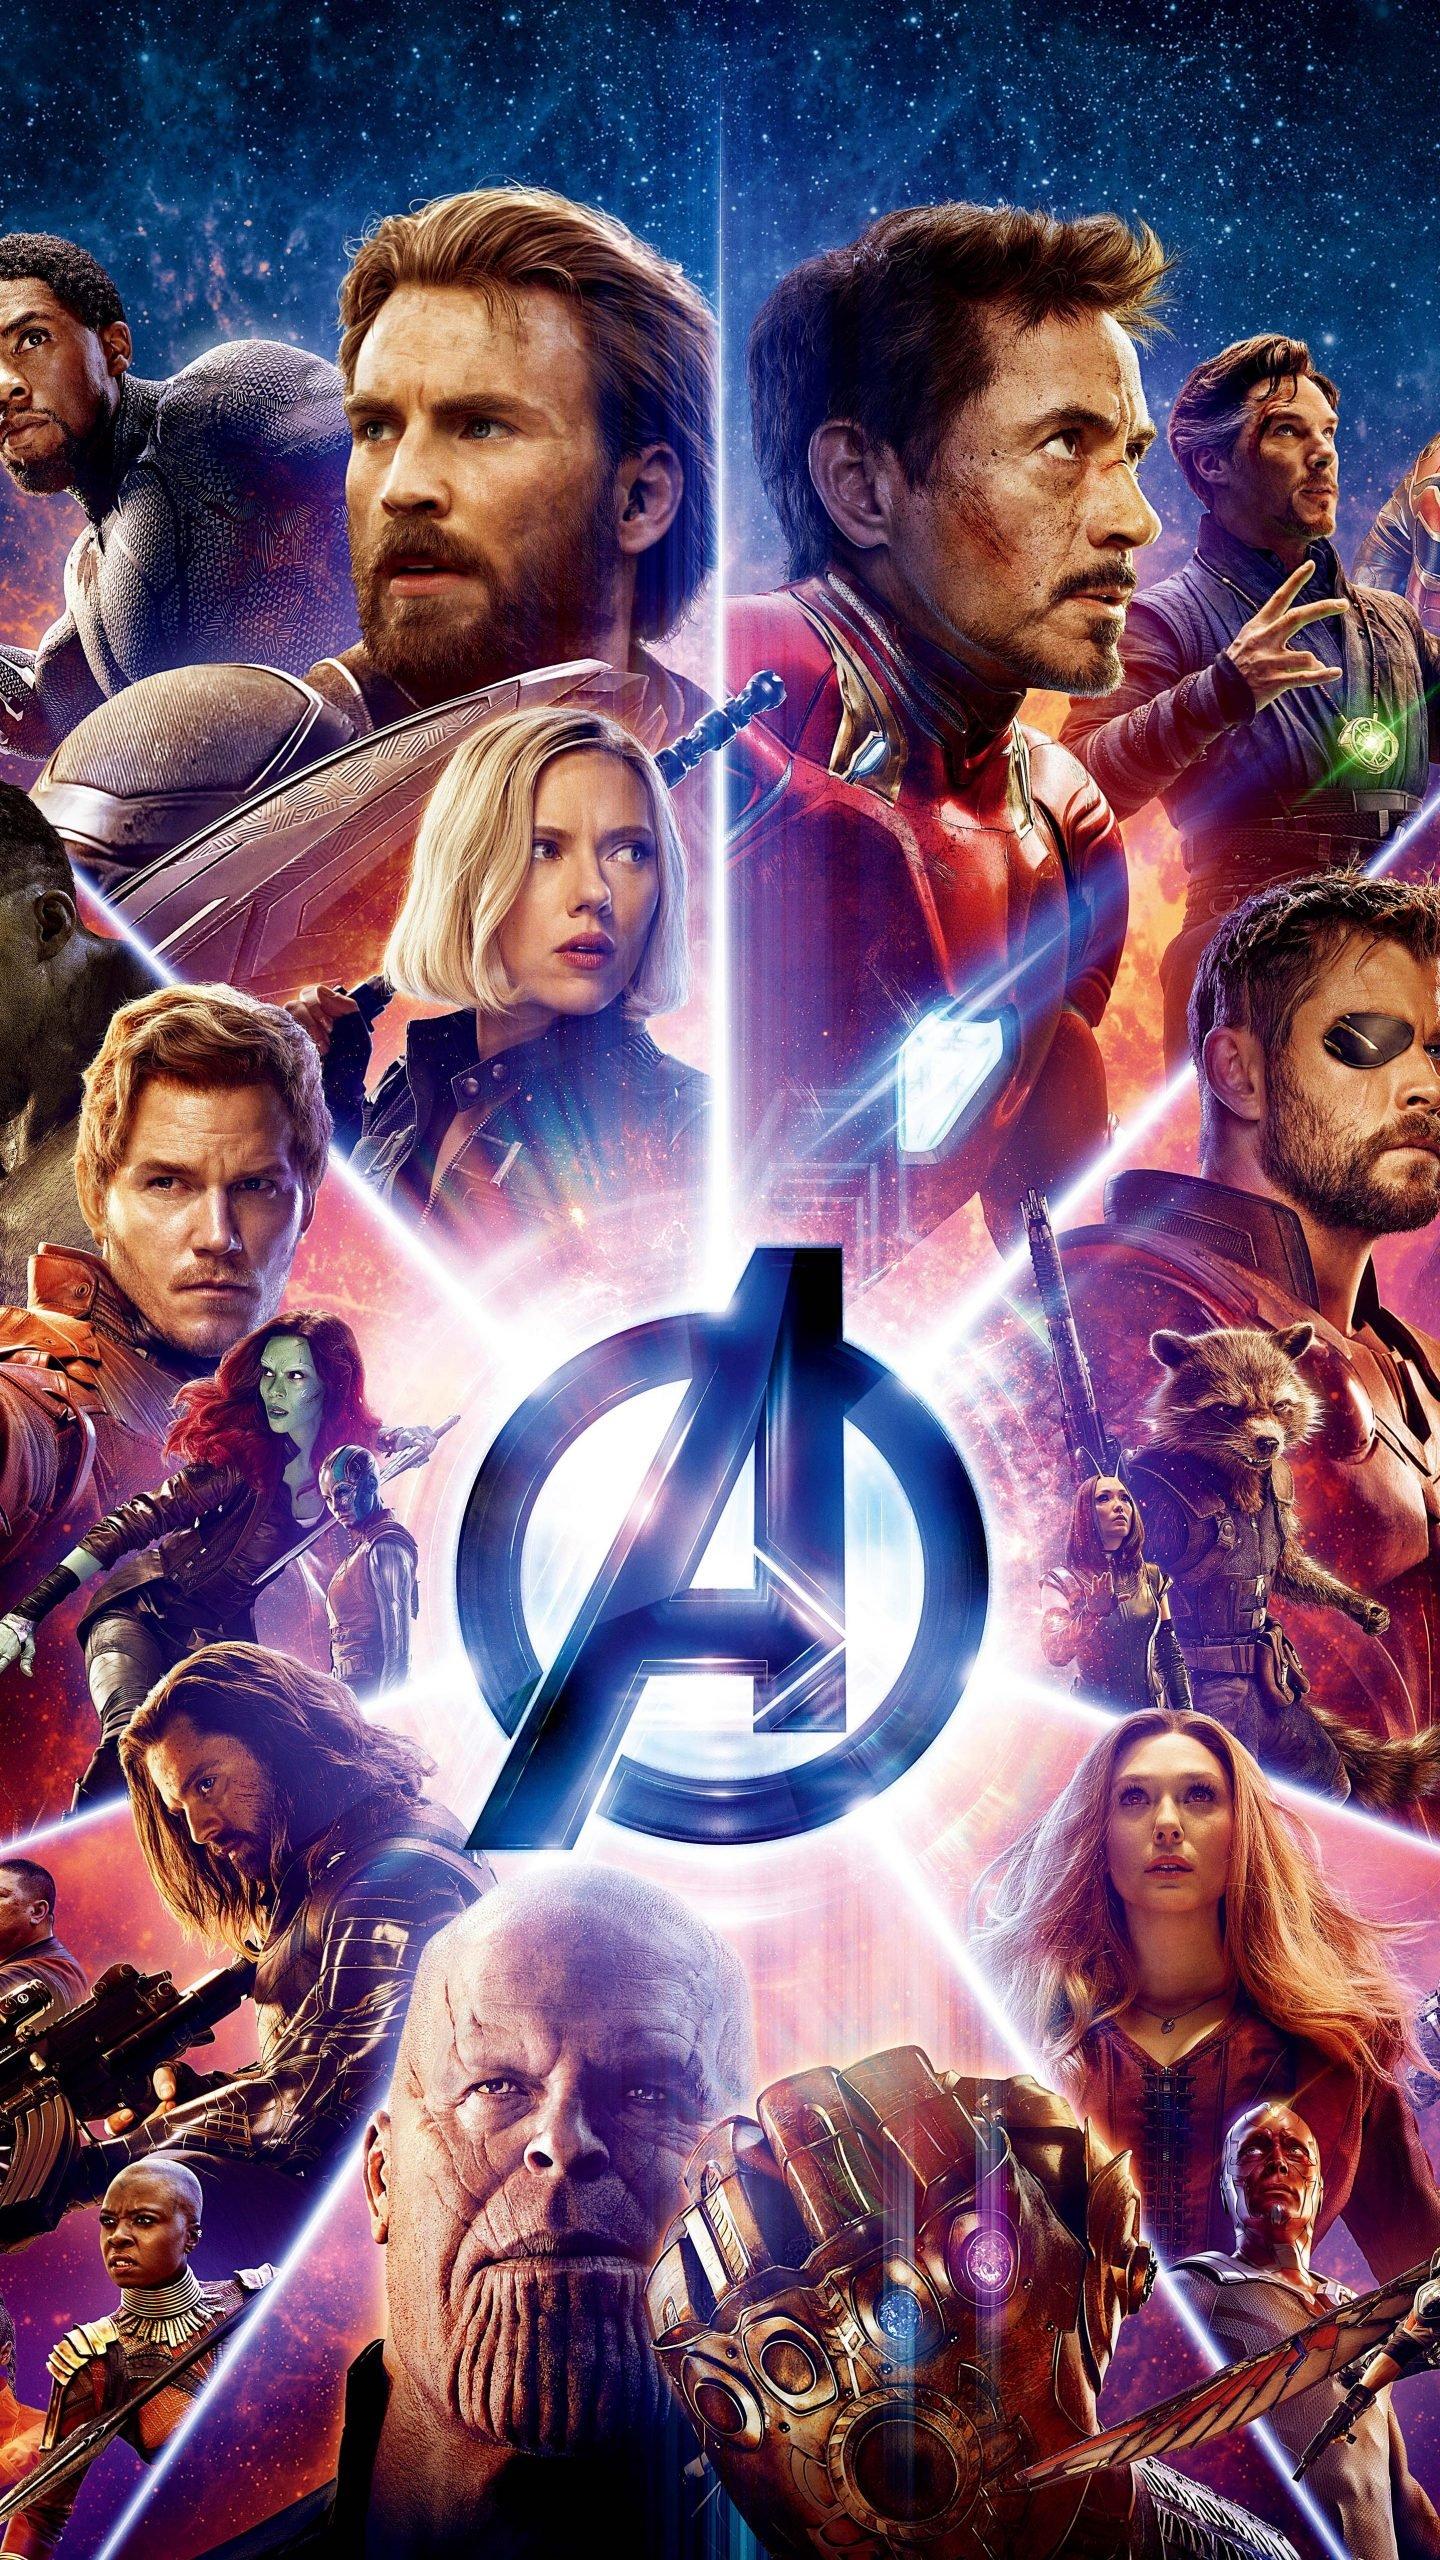 Iphone Xs Max Avengers Wallpaper : iphone, avengers, wallpaper, Iphone, Avengers, Backgrounds, 1440x2560, Download, Wallpaper, WallpaperTip